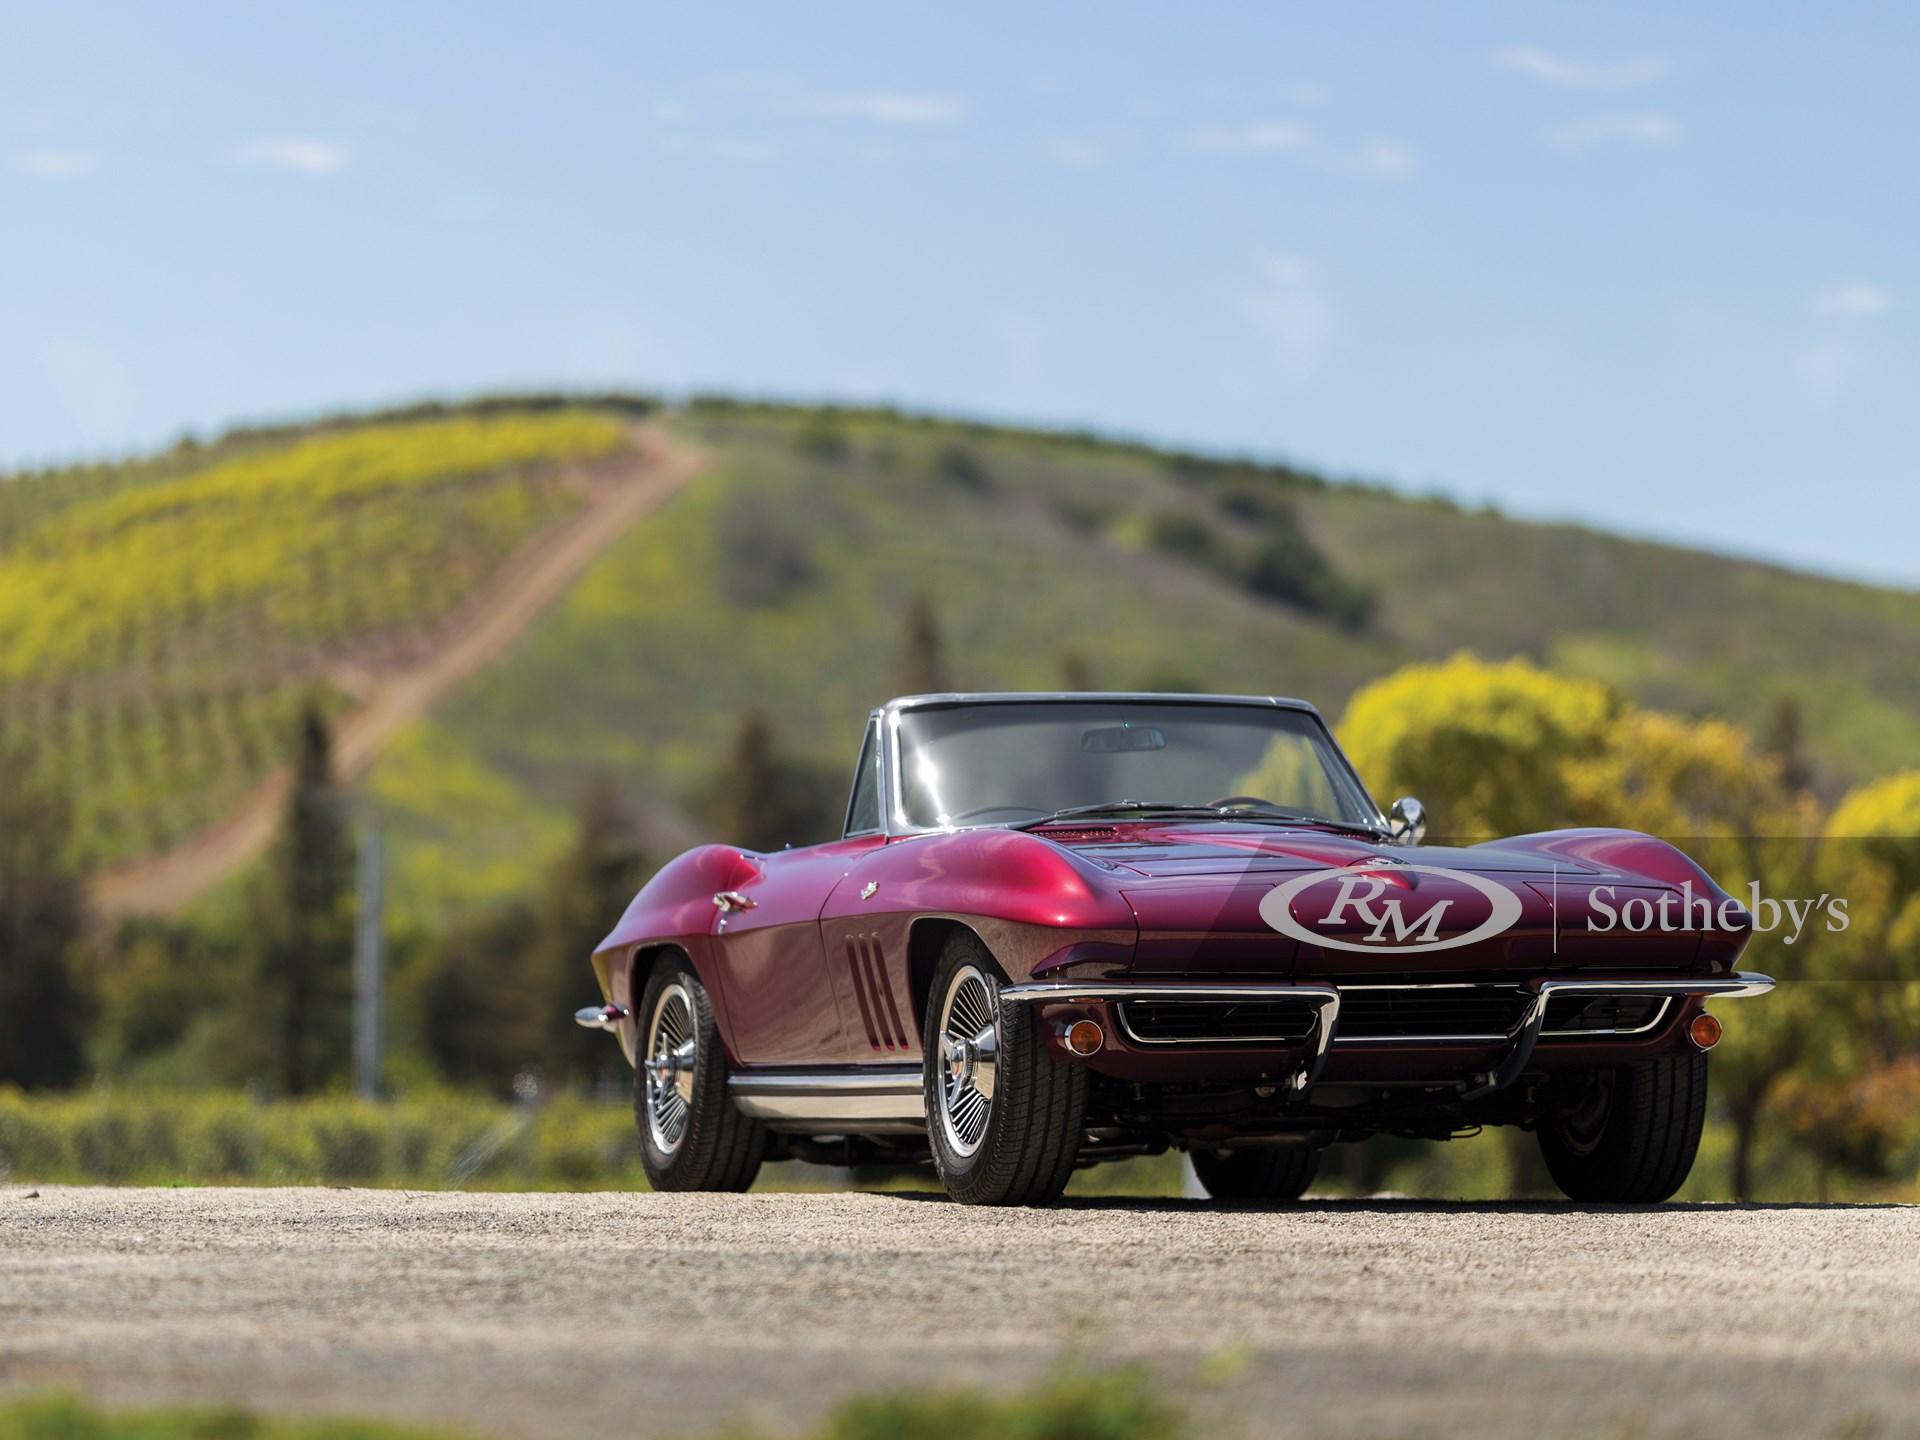 1965 Chevrolet Corvette Sting Ray Convertible  -